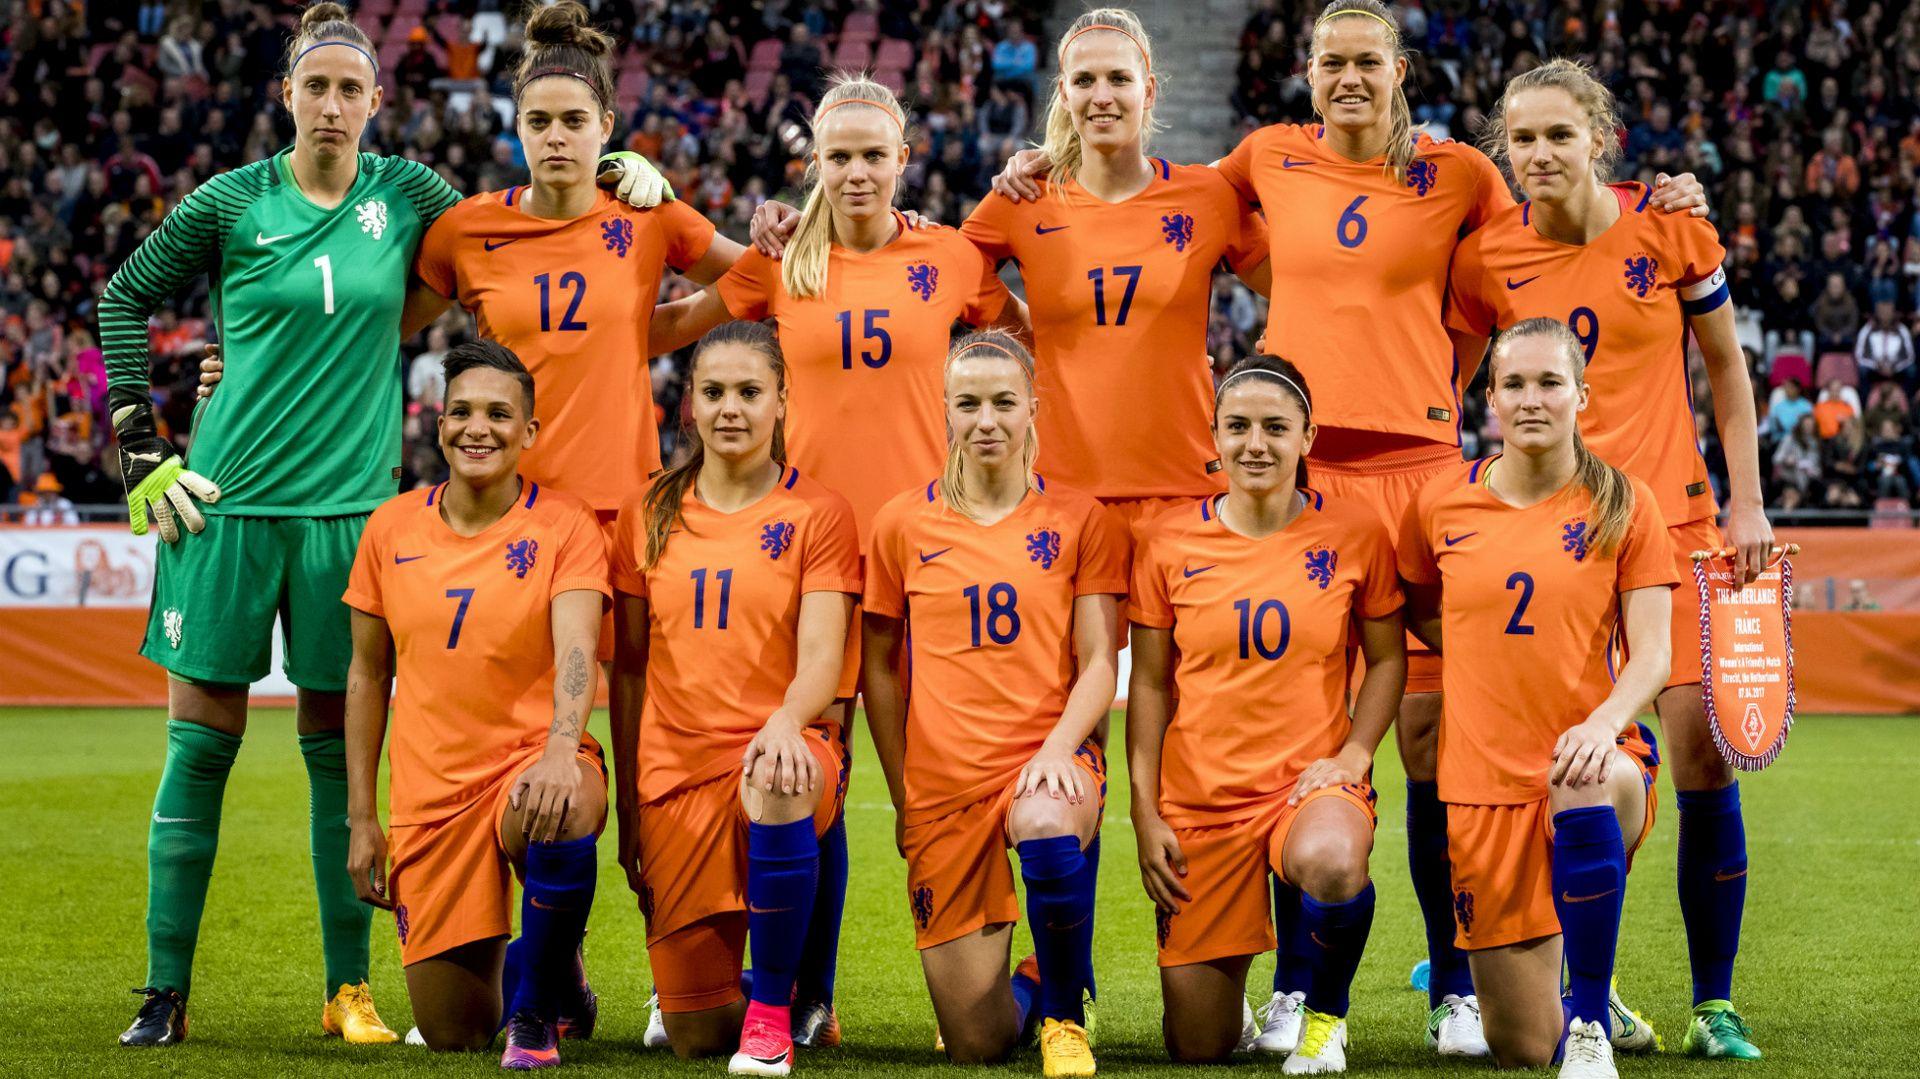 Voetbal Meisjes Voetbal Voetbalvrouwen